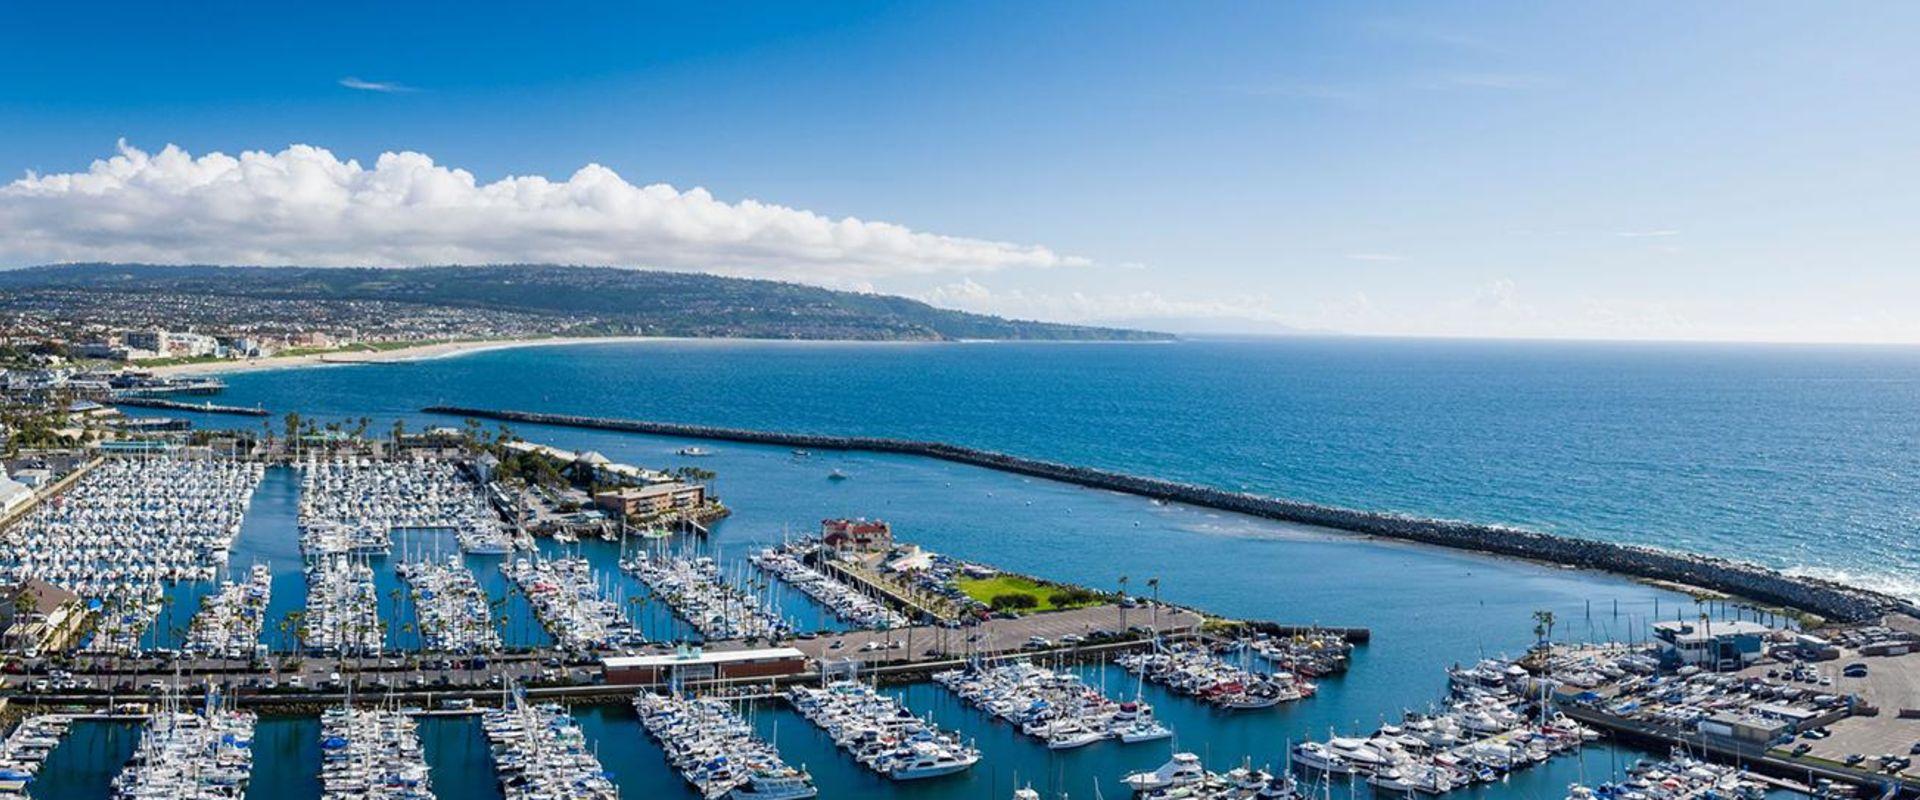 Redondo Beach King Harbor Marina And Pacific Ocean